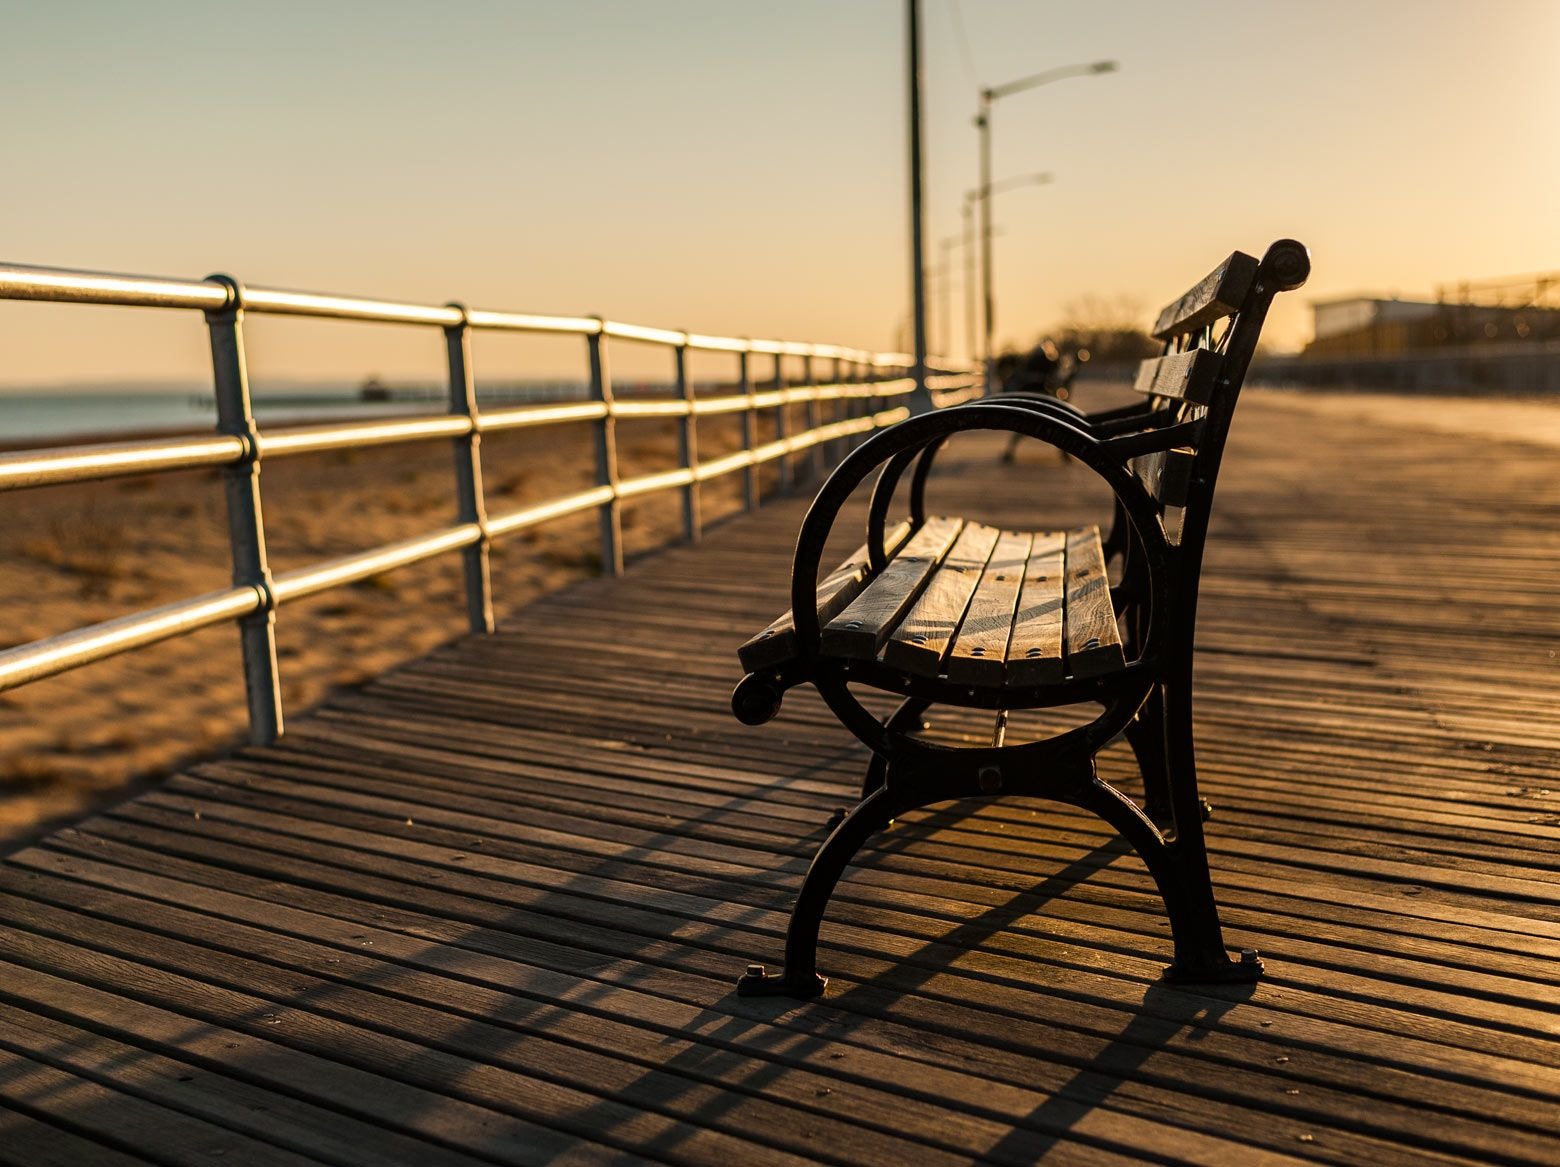 Bench At Brighton Beach Boardwalk - Huney Co